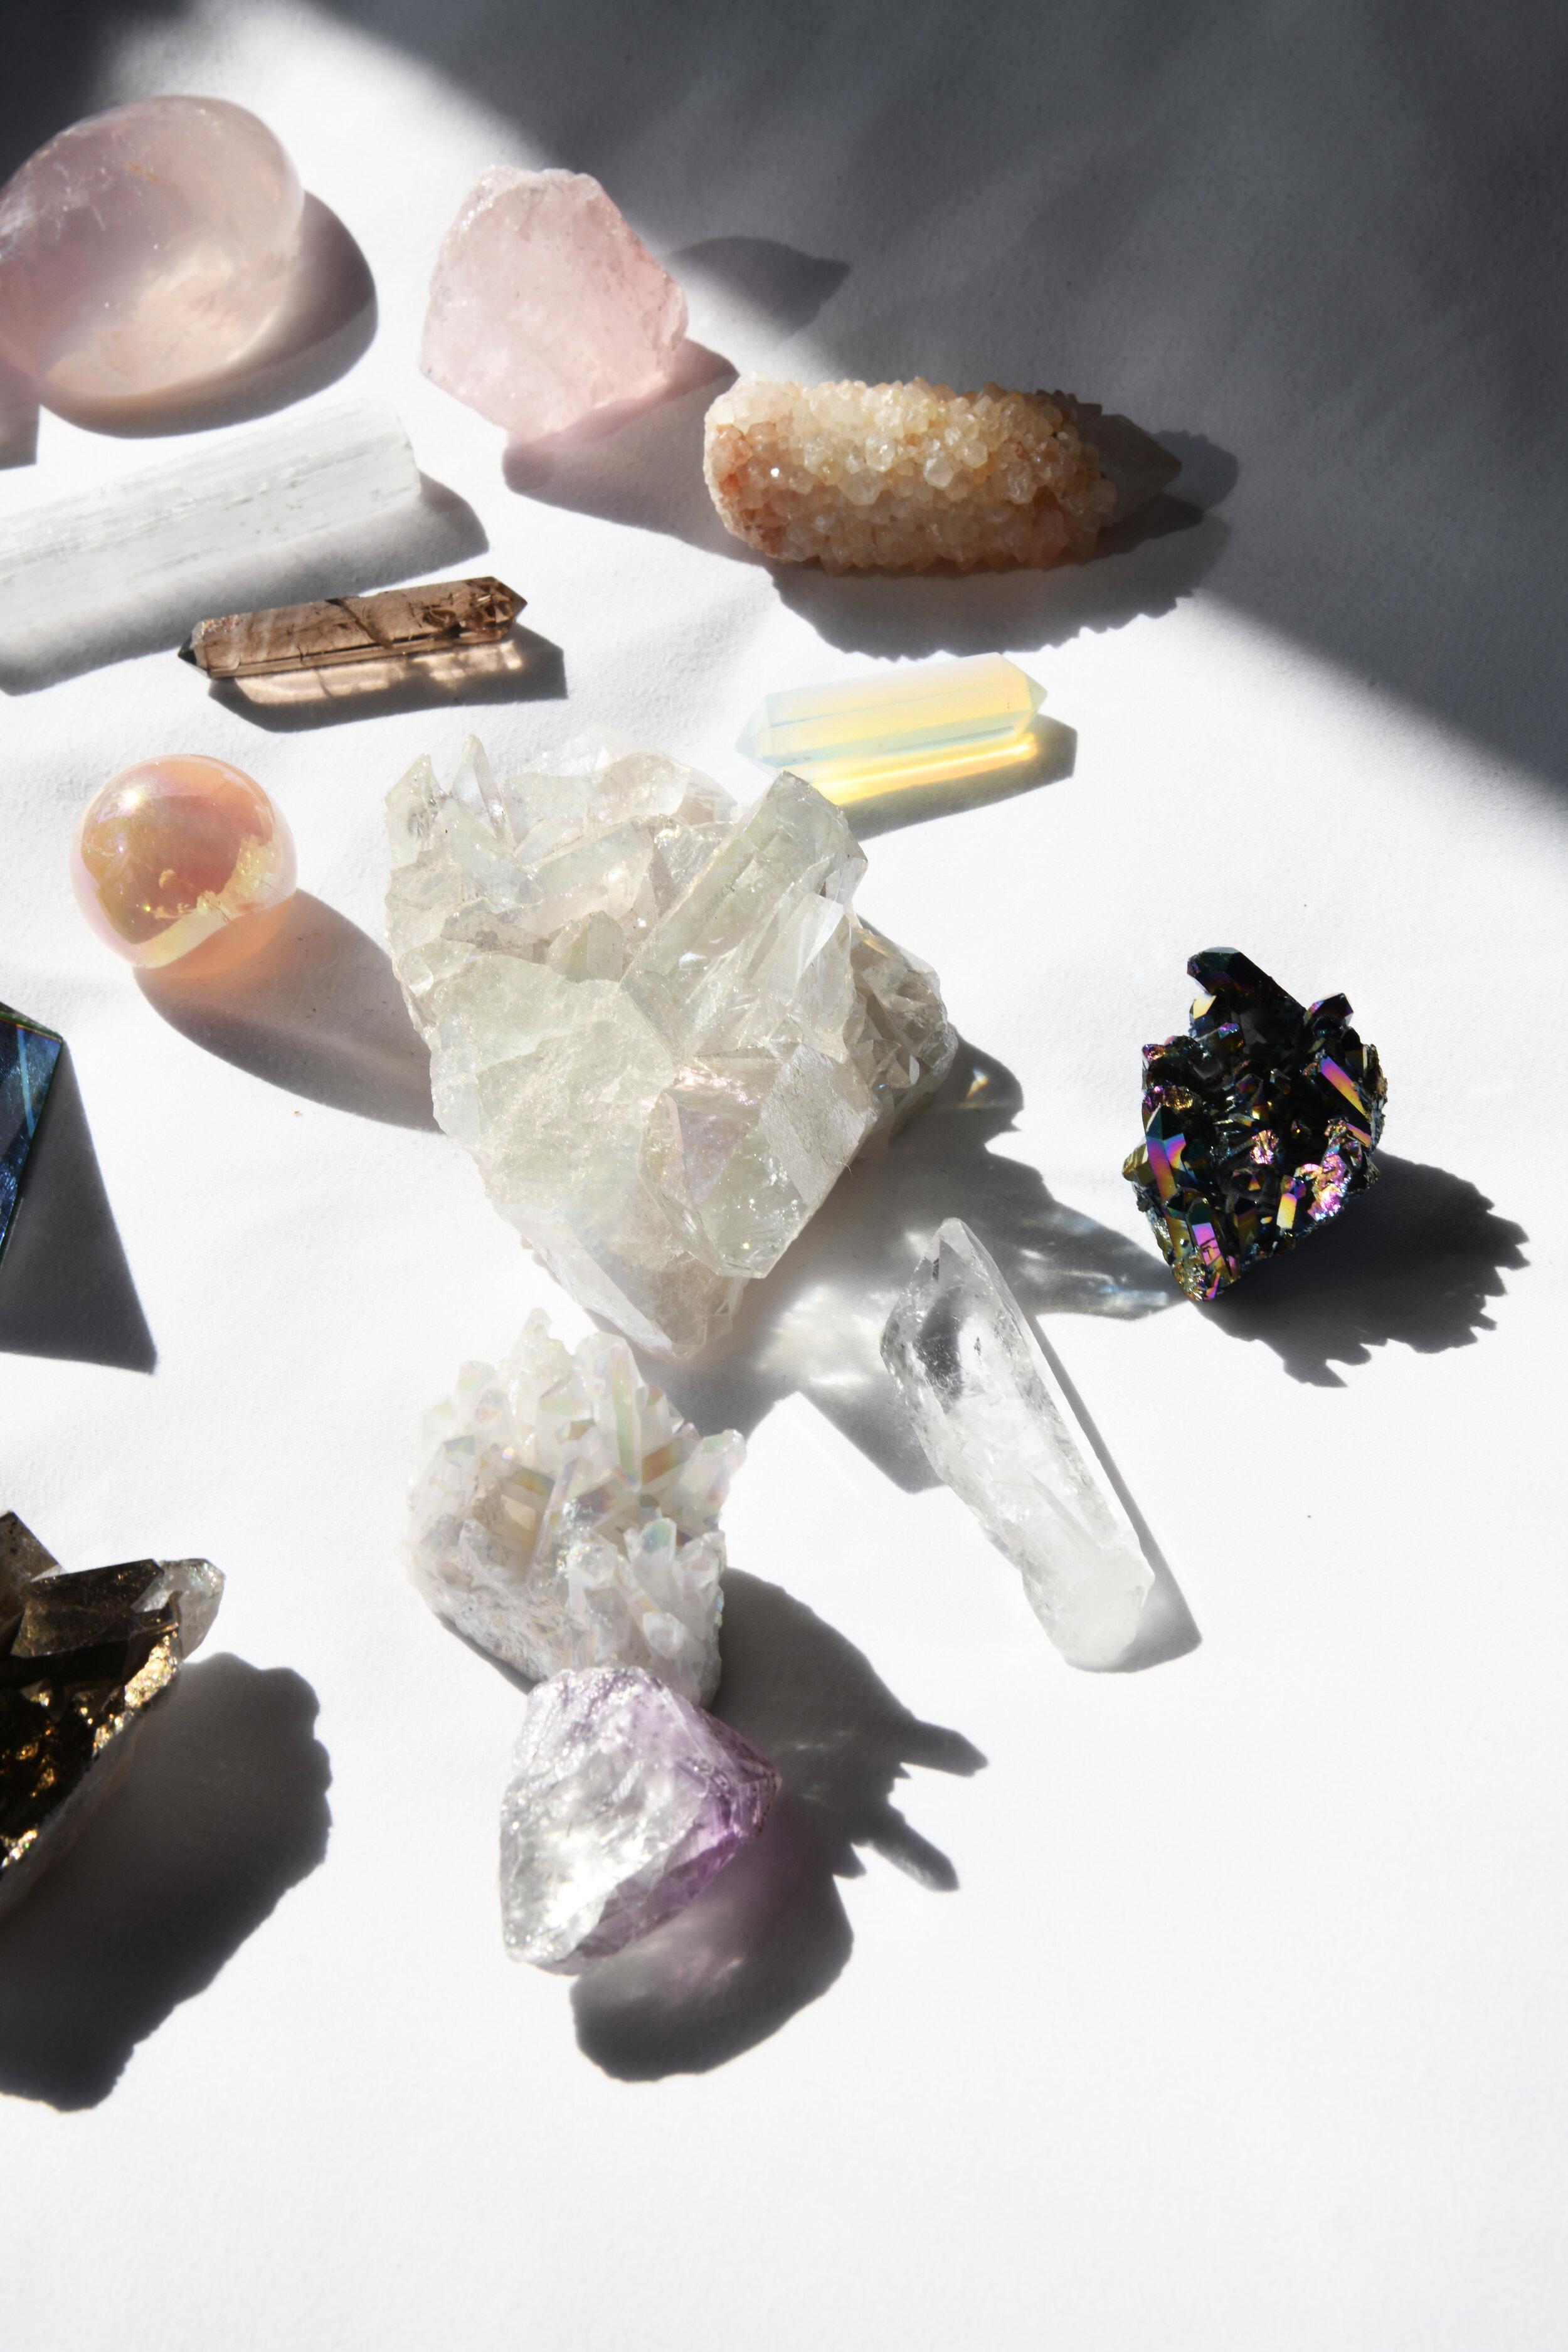 Sunday Forever Crystal Shop